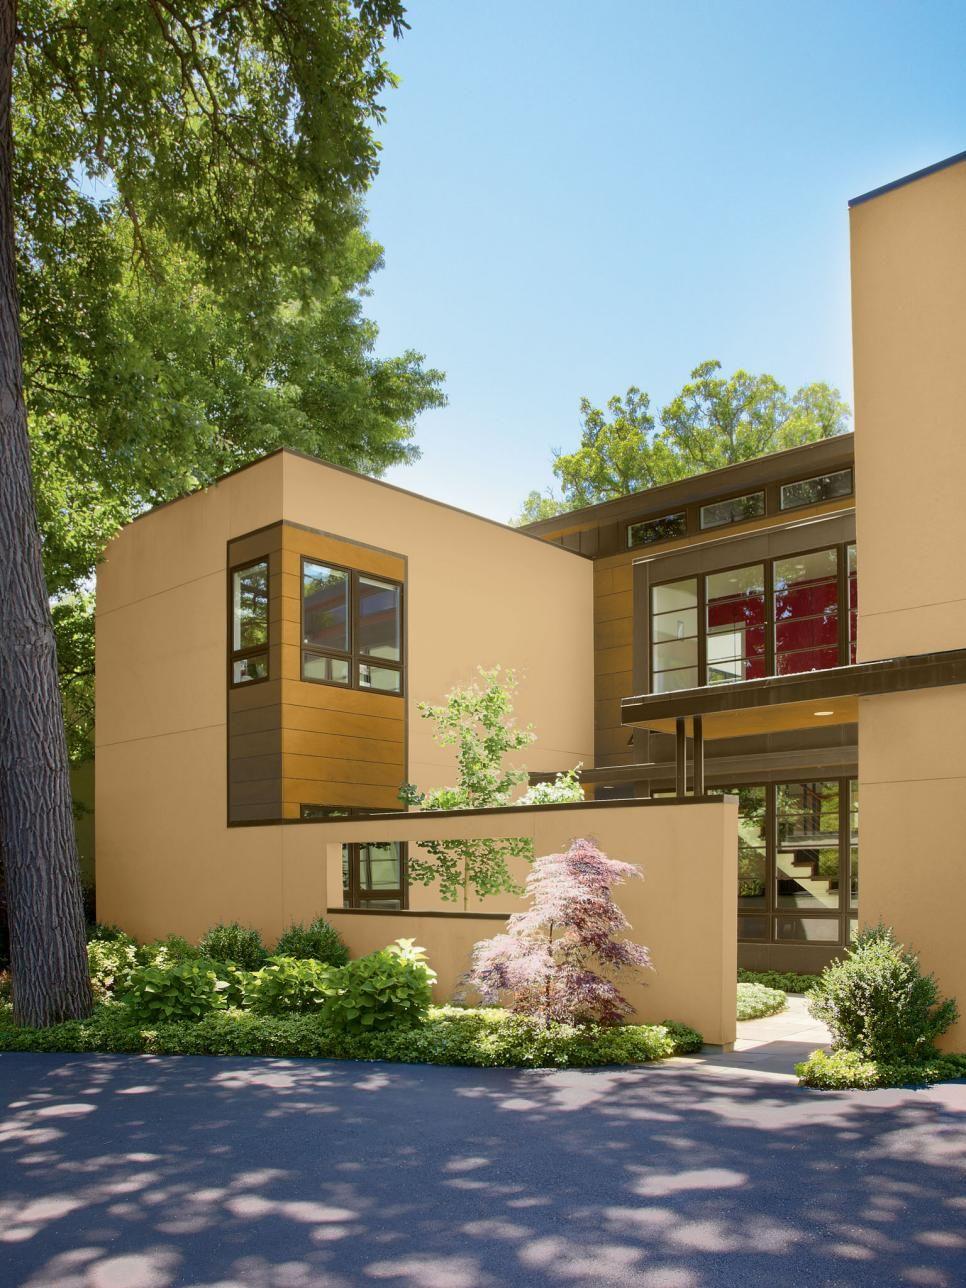 28 Inviting Home Exterior Color Ideas Contemporary House